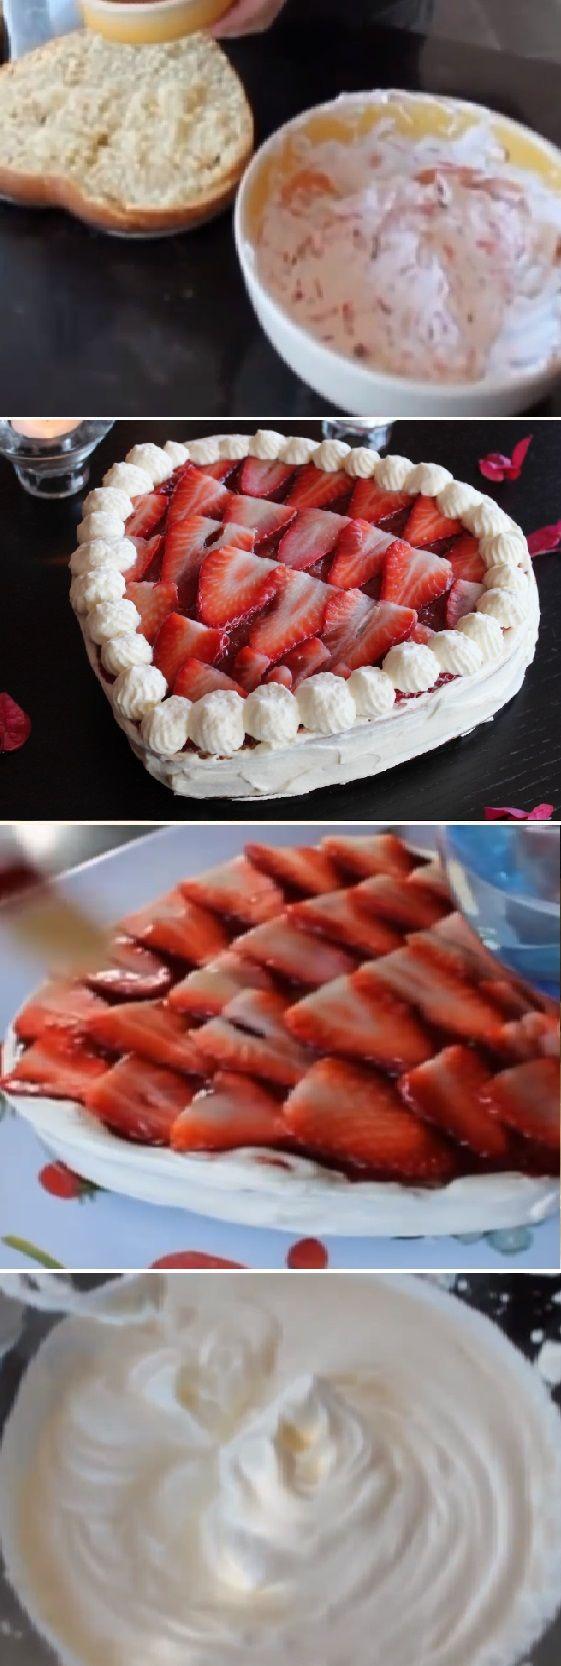 Tarta corazón de San Valentín con nata y fresas ¨Recetas románticas¨ #sanvalentin #valentinesday #valentine #love #azúcar #tips #cupcakes #cakes #dulces #receta #recipe #casero #torta #tartas #pastel #nestlecocina #bizcocho #bizcochuelo #tasty #cocina #chocolate #pan #panes Si te gusta dinos HOLA y dale a Me Gusta MIREN …